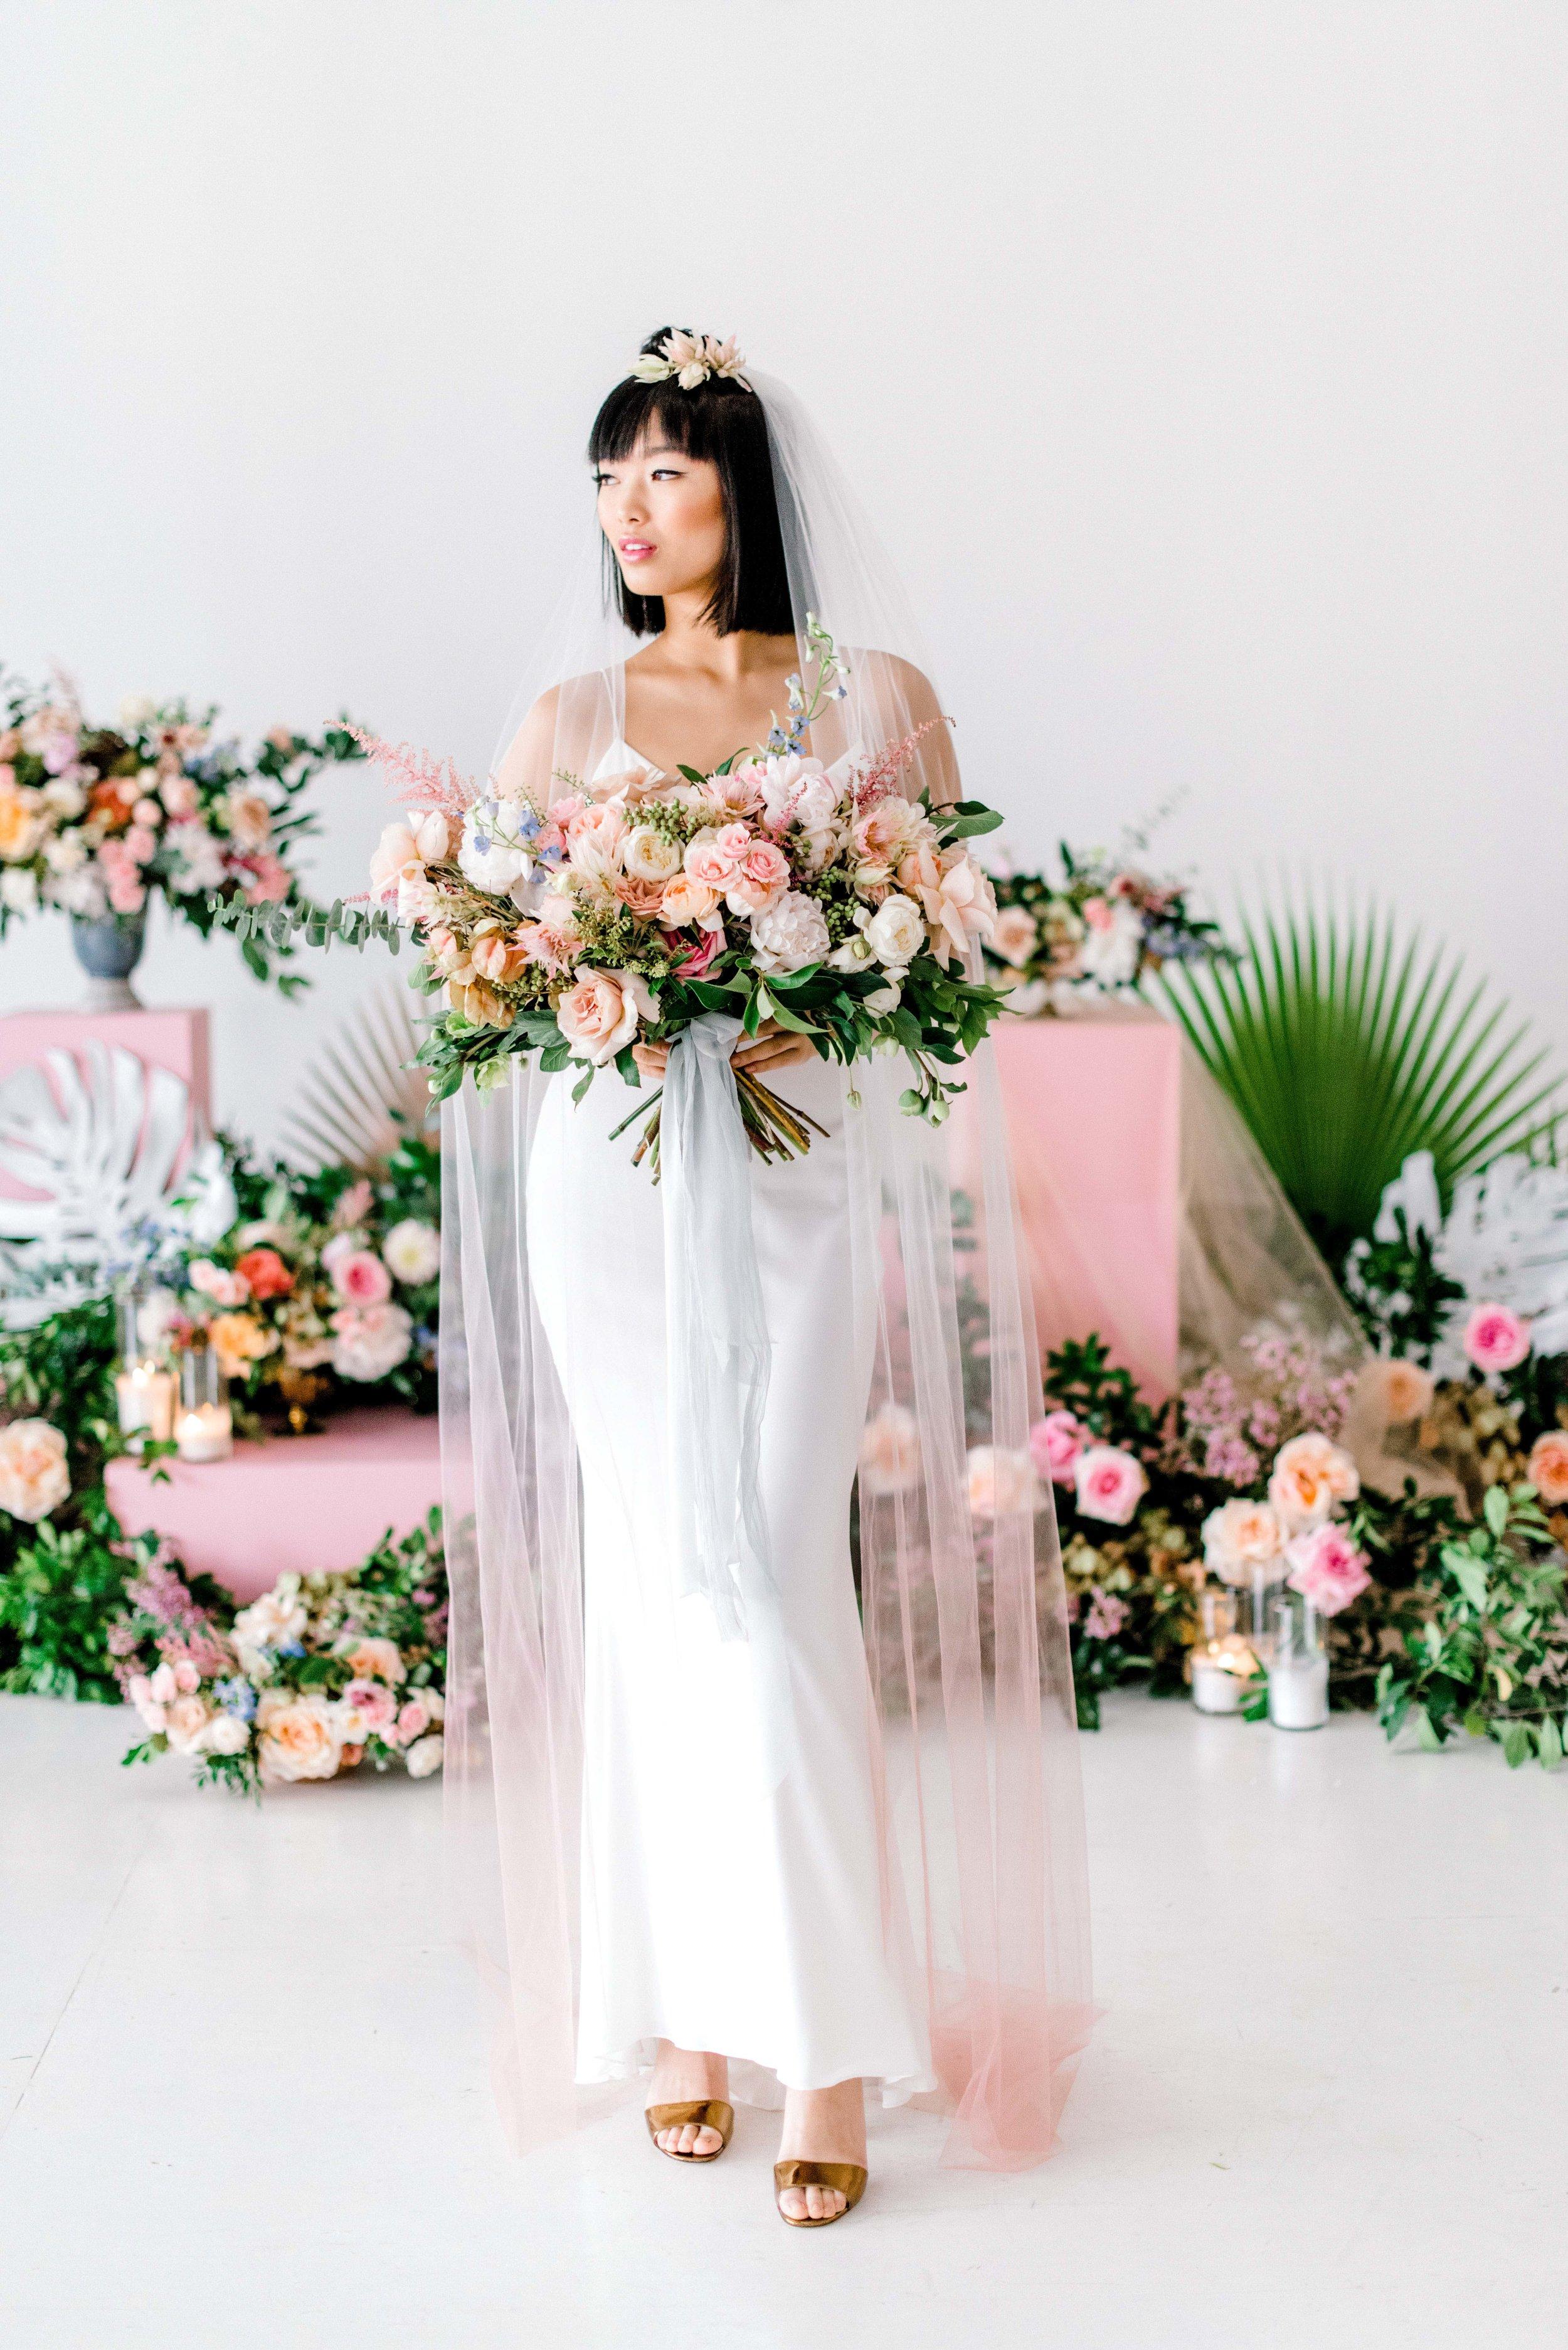 Houston-Wedding-Photographer-Editorial-Fine-Art-Film-Destination-Dallas-Texas-Mibellarosa-Josh-Dana-Fernandez-Photography-18.jpg